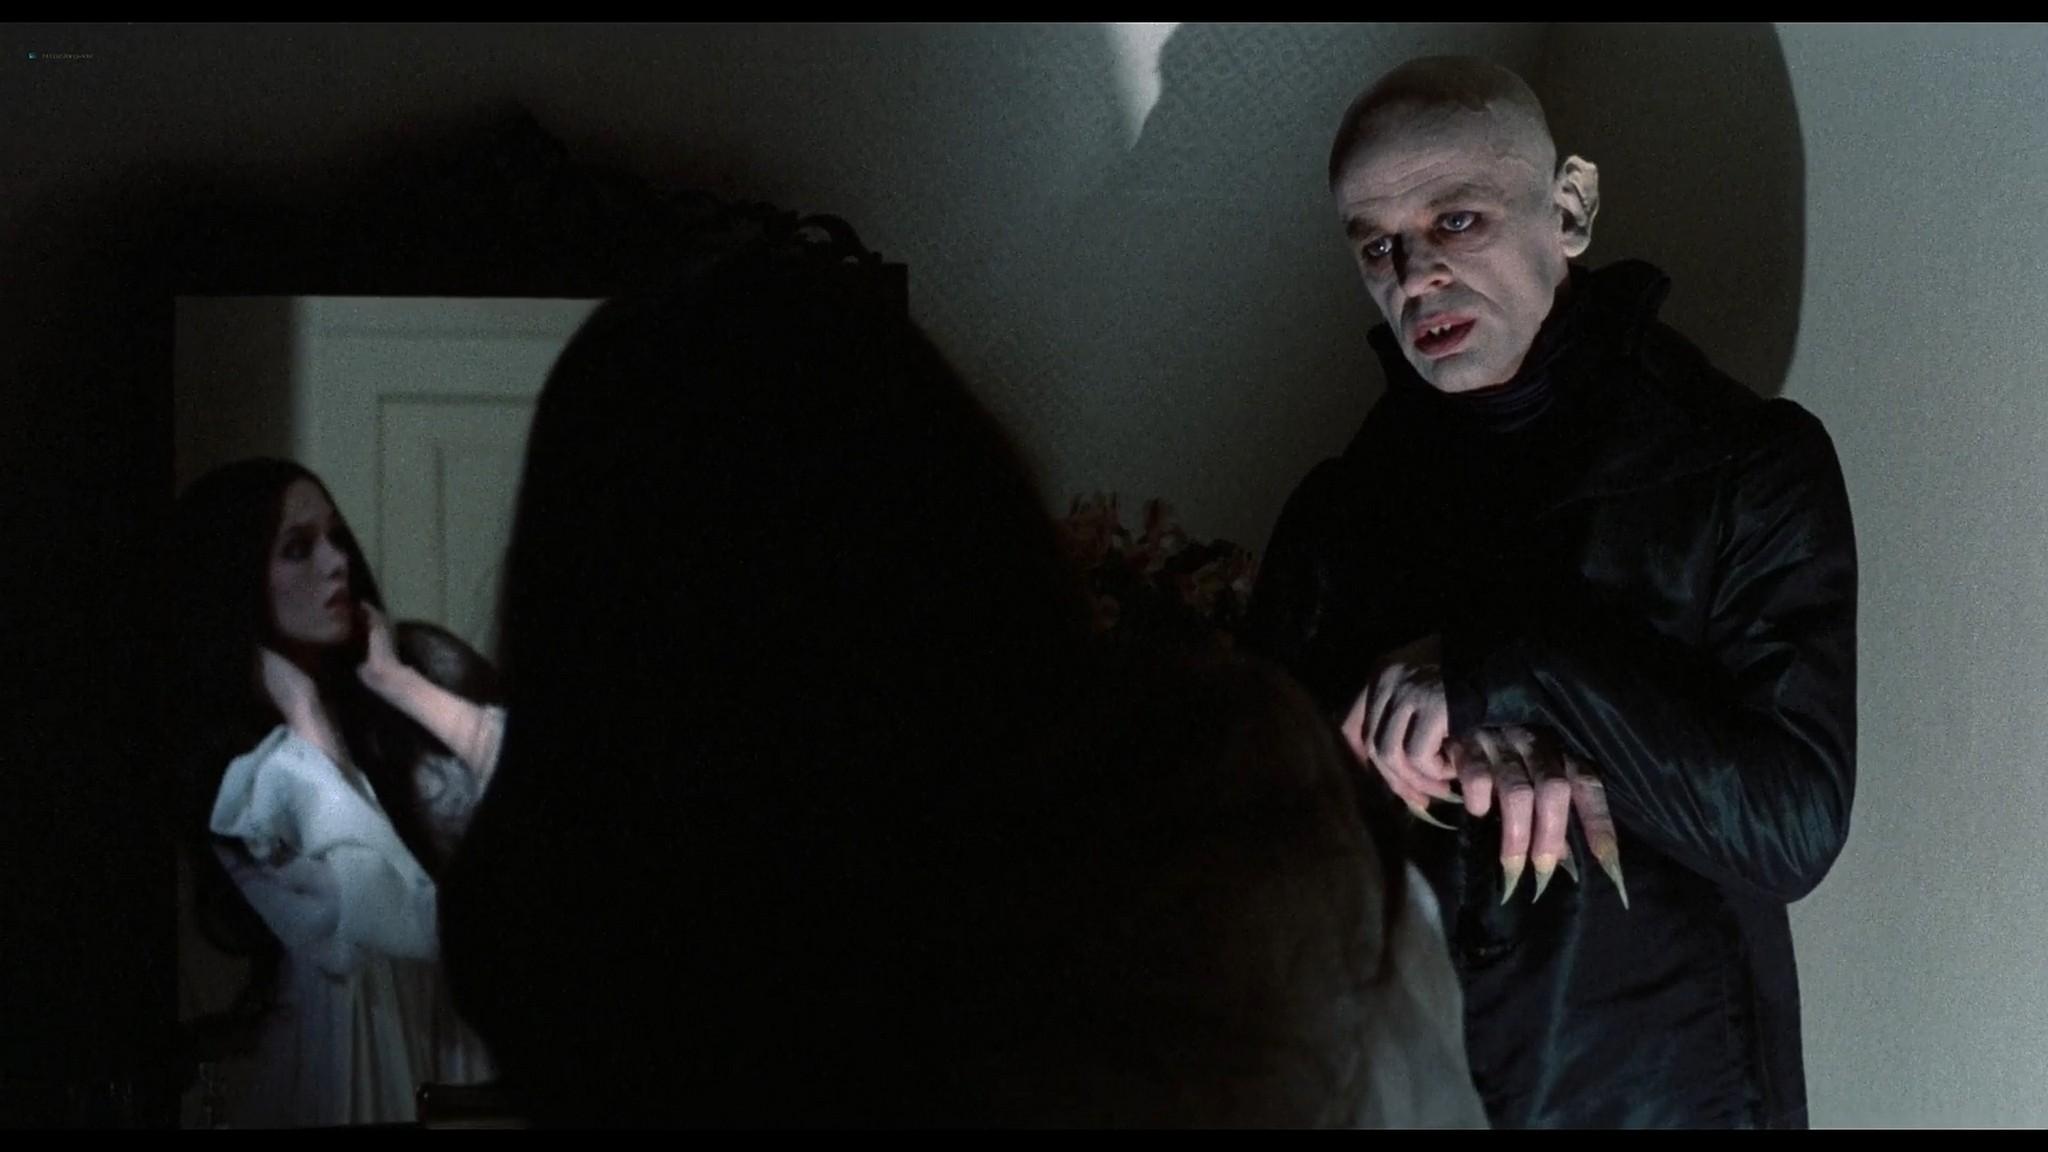 Isabelle Adjani cute and sexy Nosferatu the Vampyre 1979 1080p BluRay 5